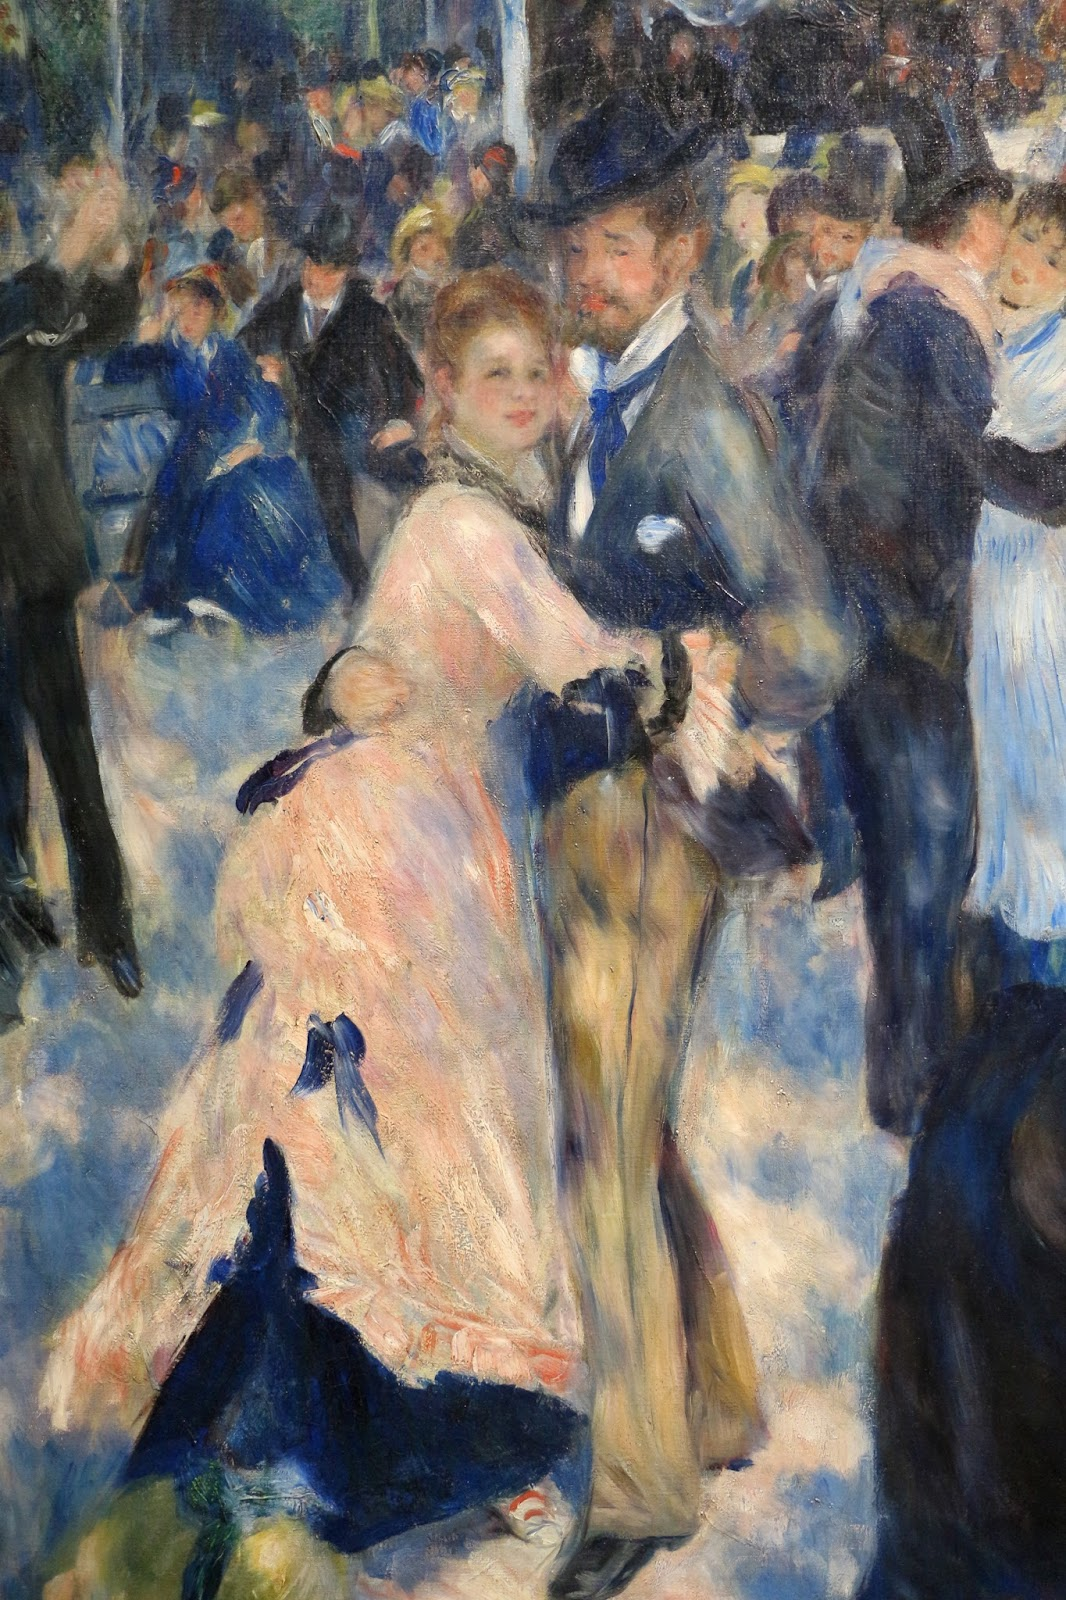 Le Bal Du Moulin De La Galette : moulin, galette, Pierre-Auguste, Renoir, Moulin, Galette,, Tutt'Art@, Pittura, Scultura, Poesia, Musica